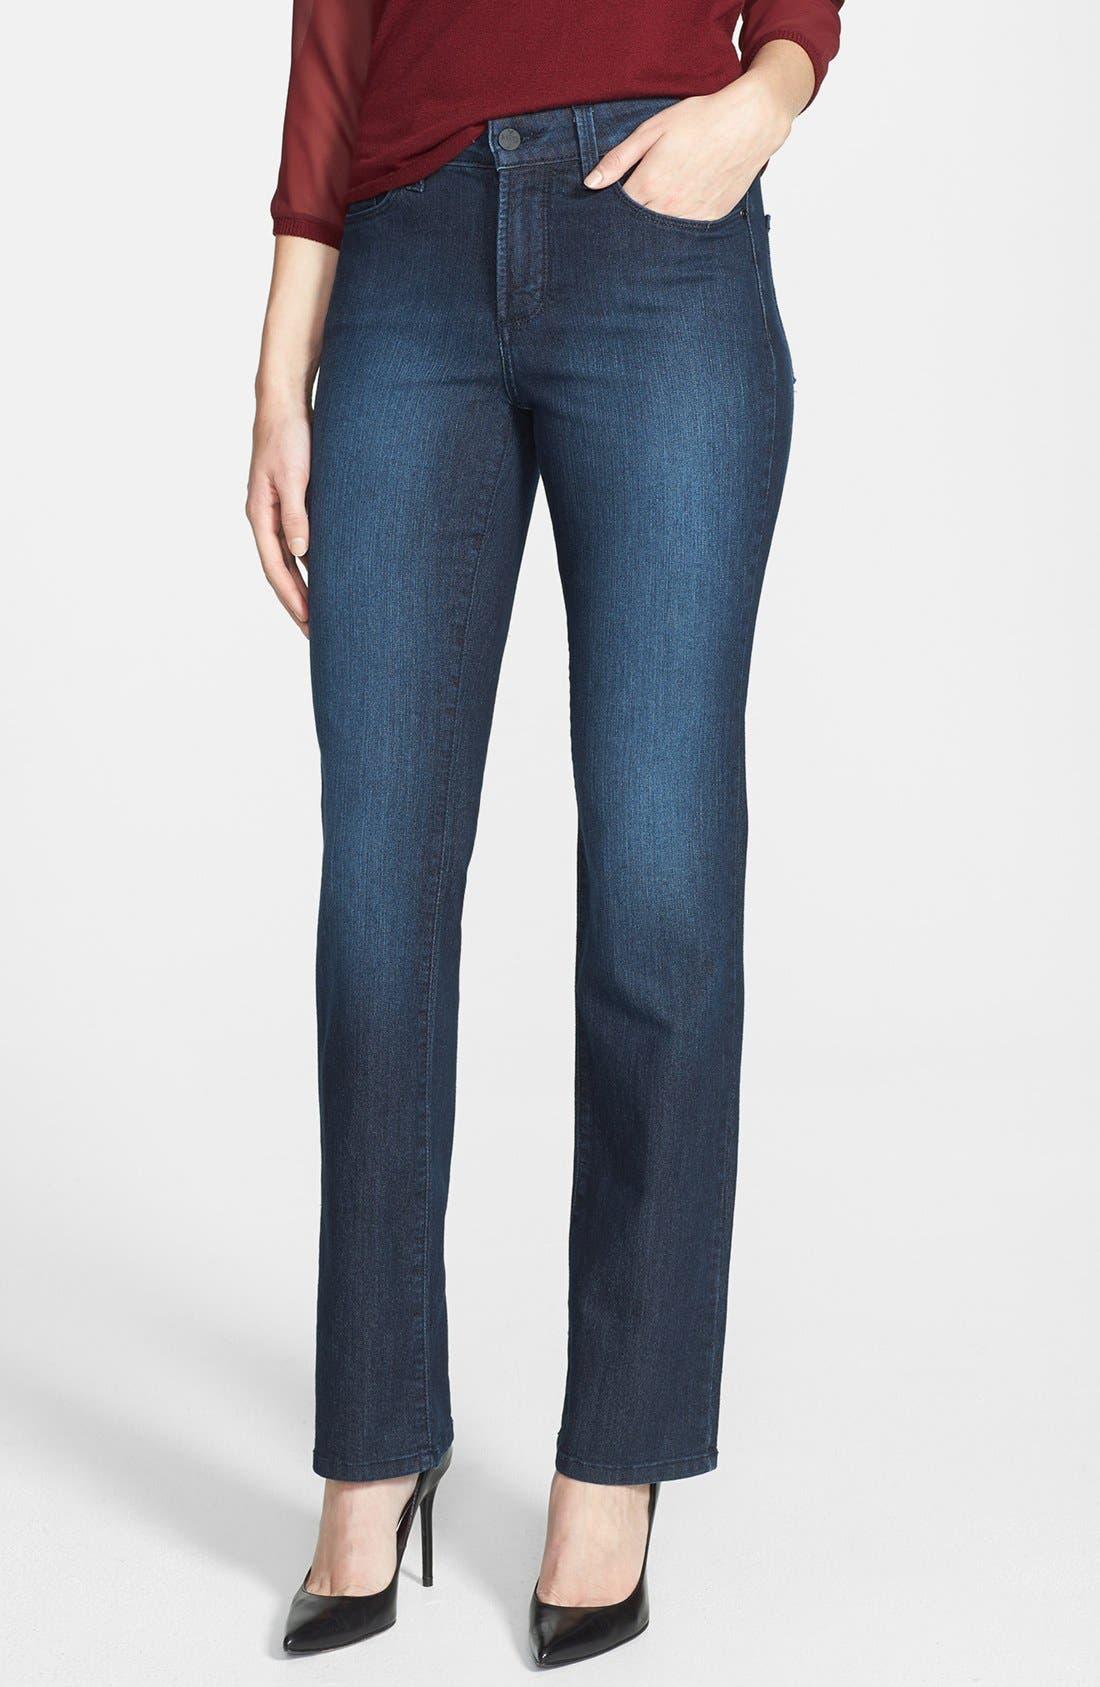 Main Image - NYDJ 'Marilyn' Stretch Straight Leg Jeans (Dana Point)